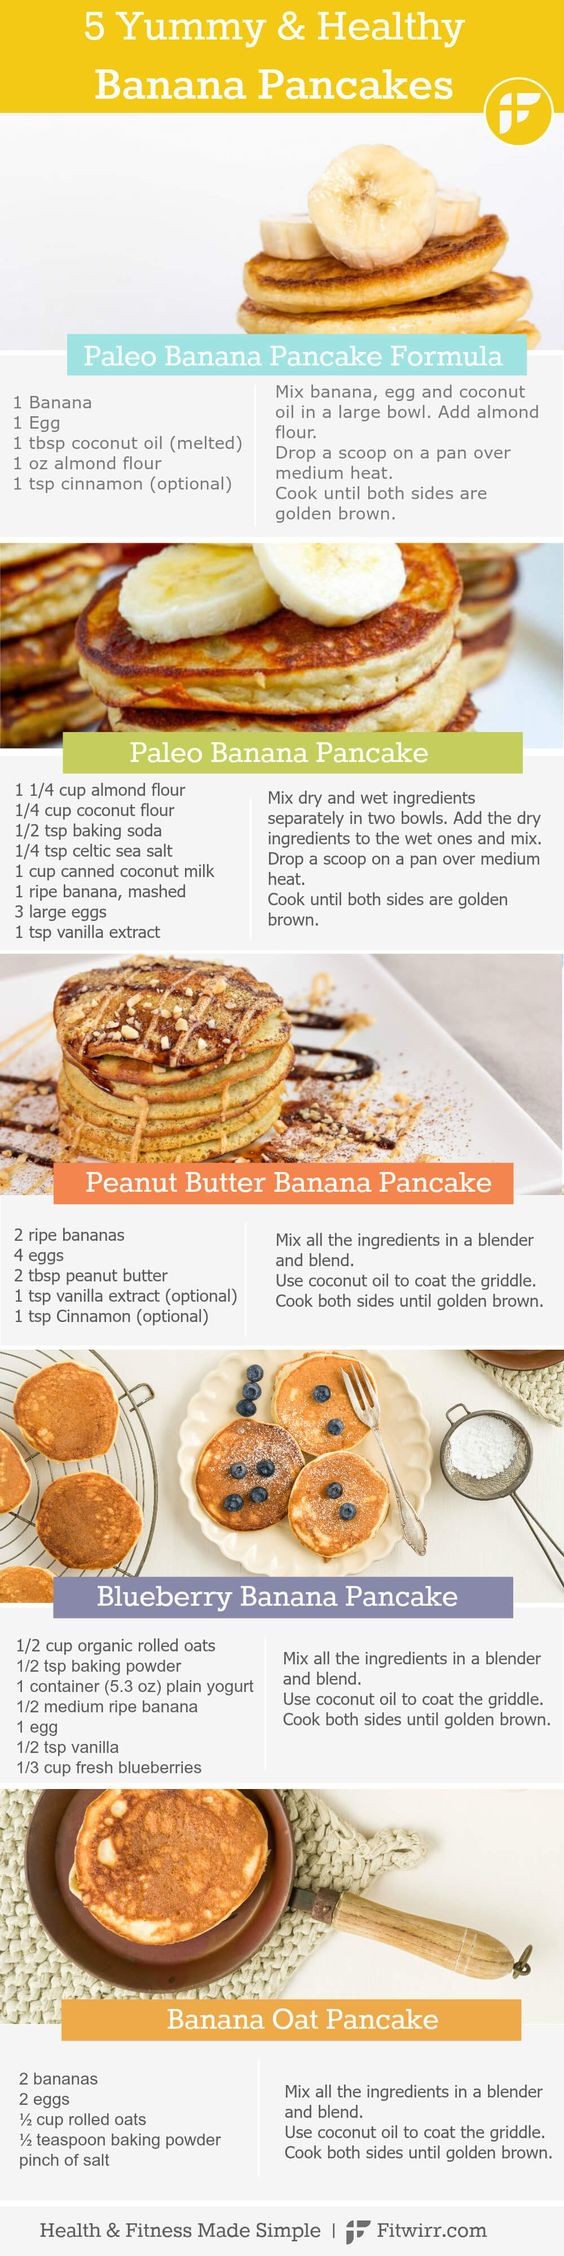 Healthy delicious banana pancakes for the whole family. #bananapancakes #healthybreakfast